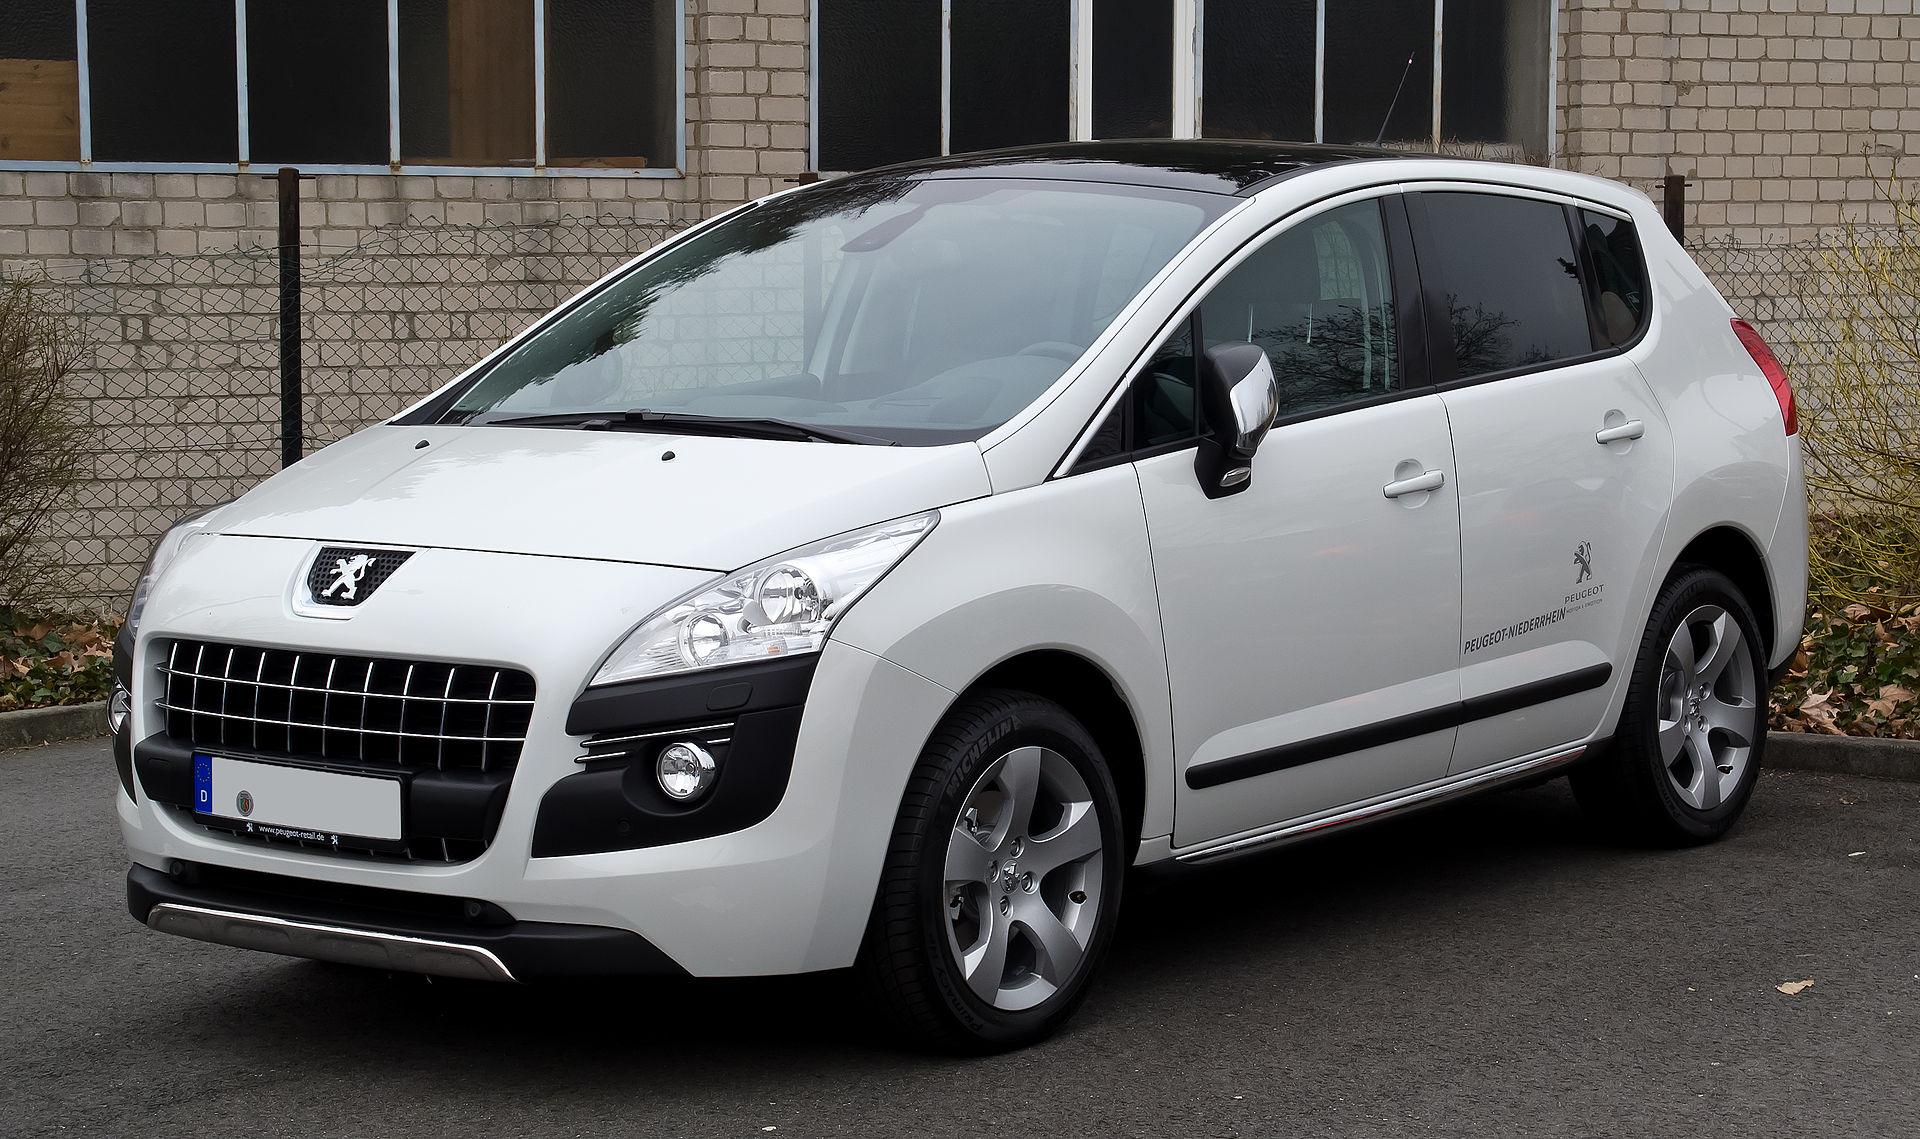 2008 (2013) 2008 12 Peugeot 3008 HDi FAP 110 Allure